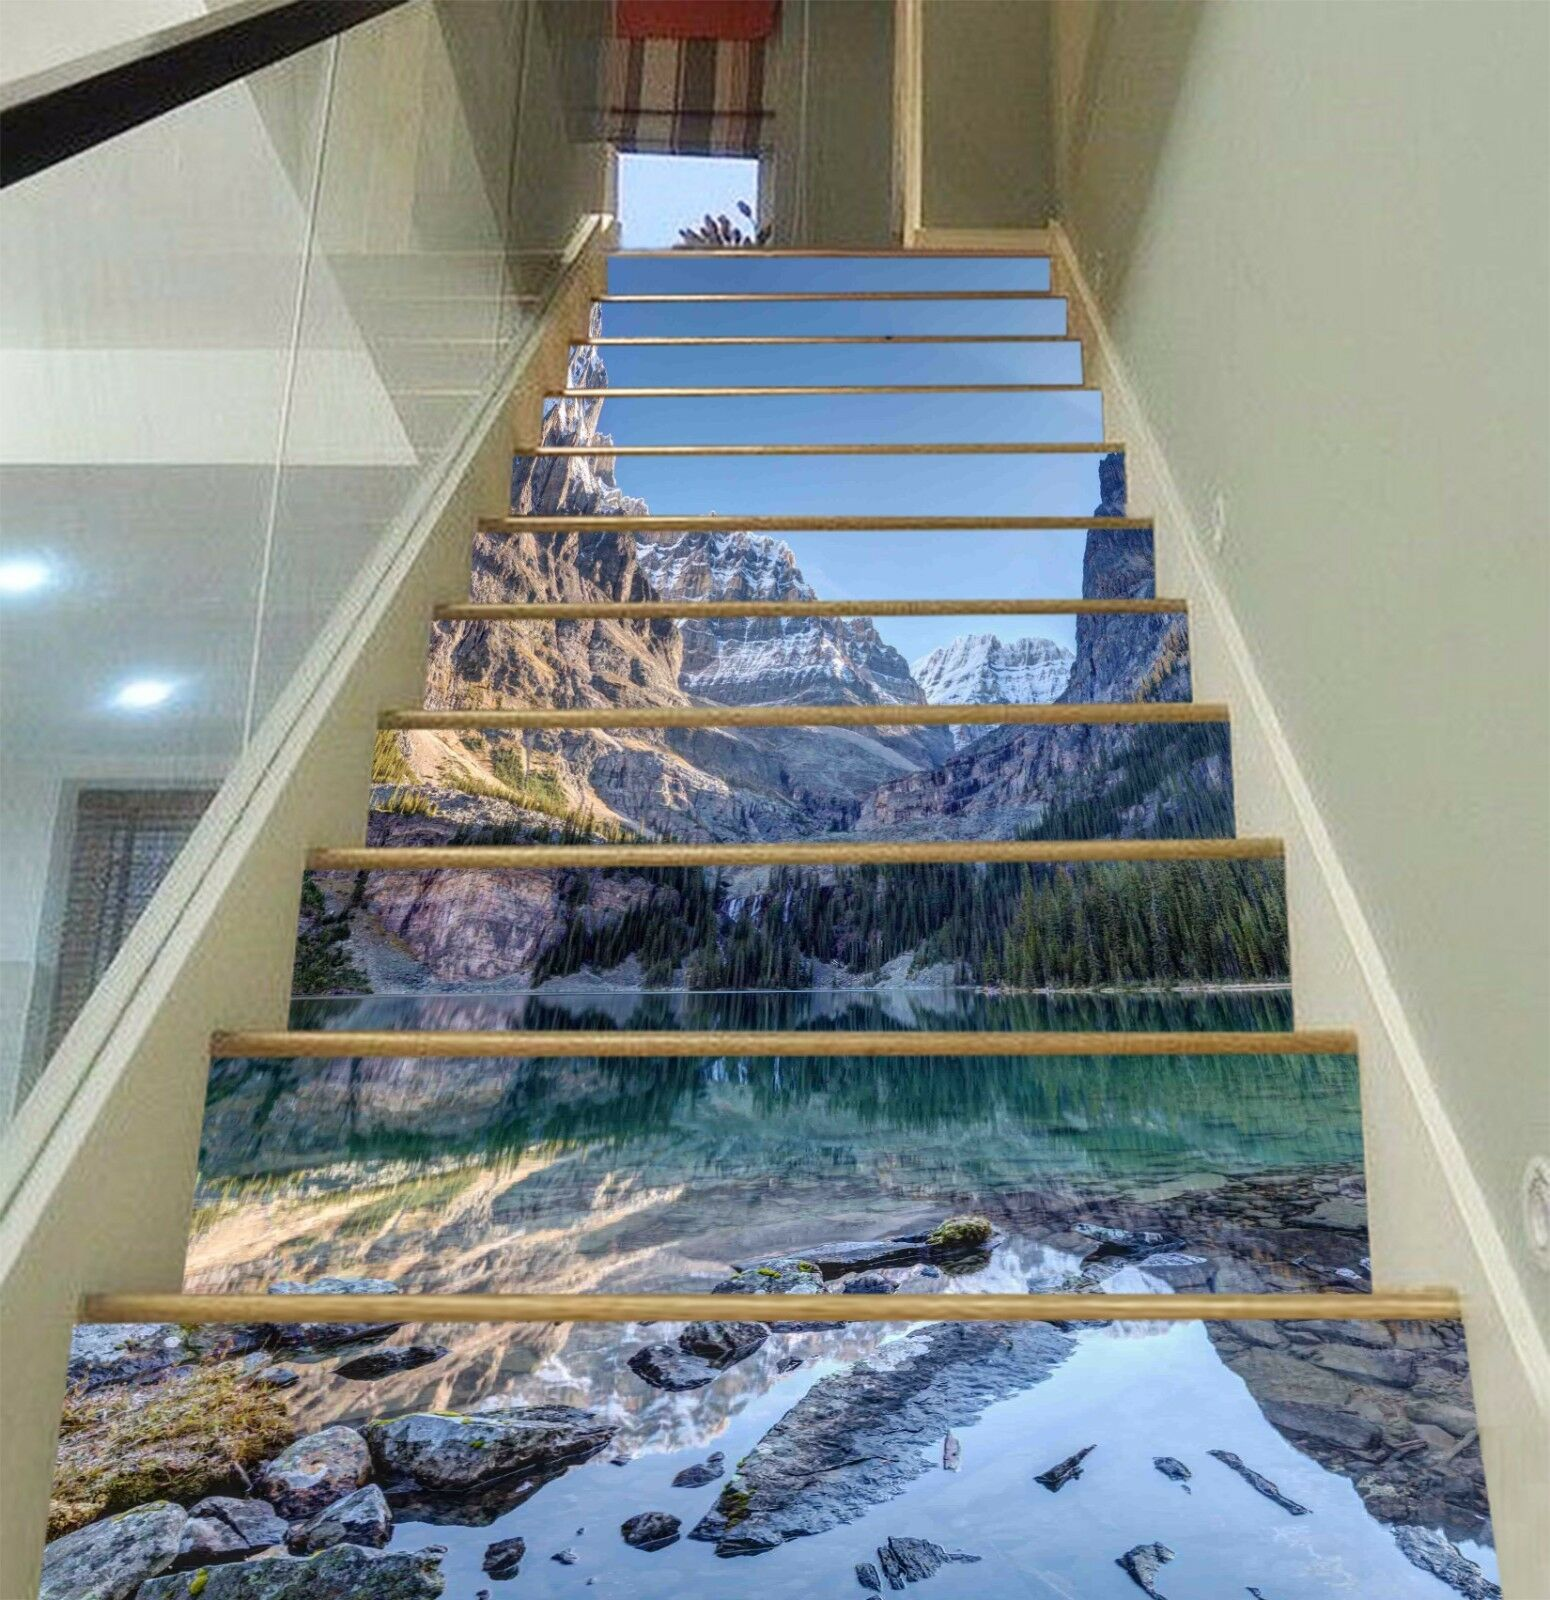 3D Nice Lake 7424 Stair Risers Decoration Photo Mural Vinyl Decal Wallpaper AU